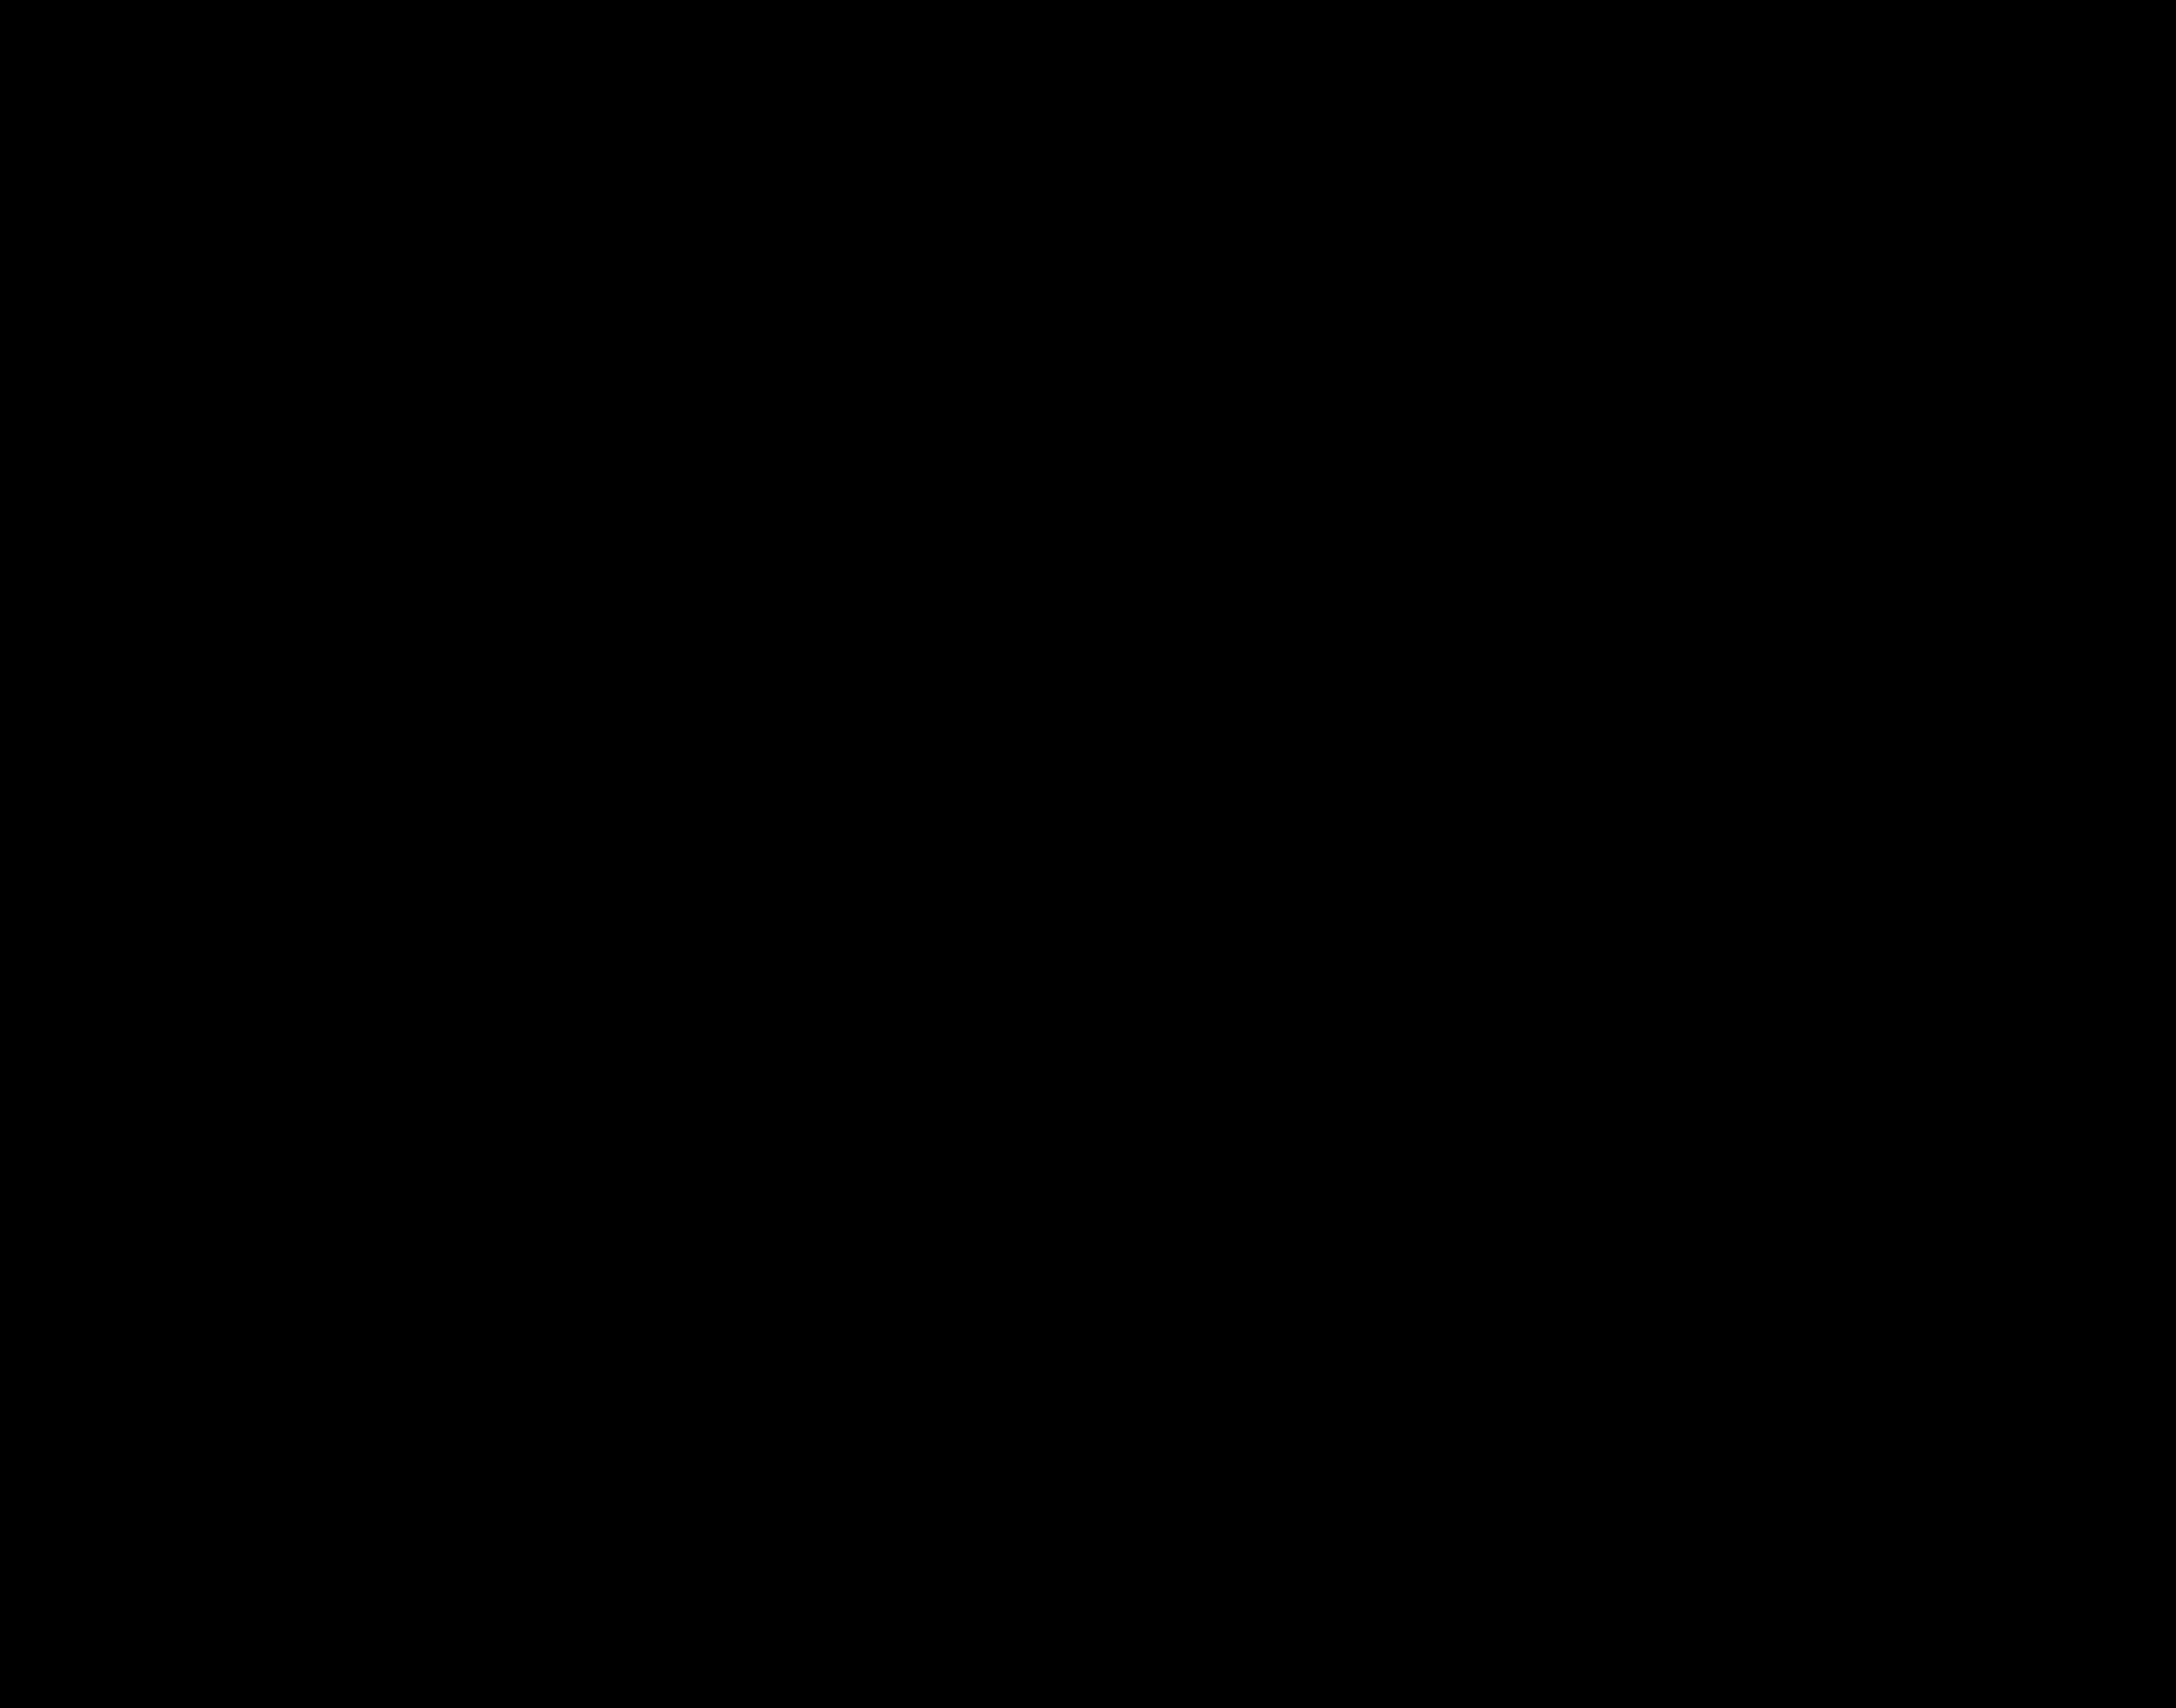 On.Cc 東網 (04/2021): 做「一日獸醫」後確立人生目標 患霍奇金淋巴瘤病童成功升學